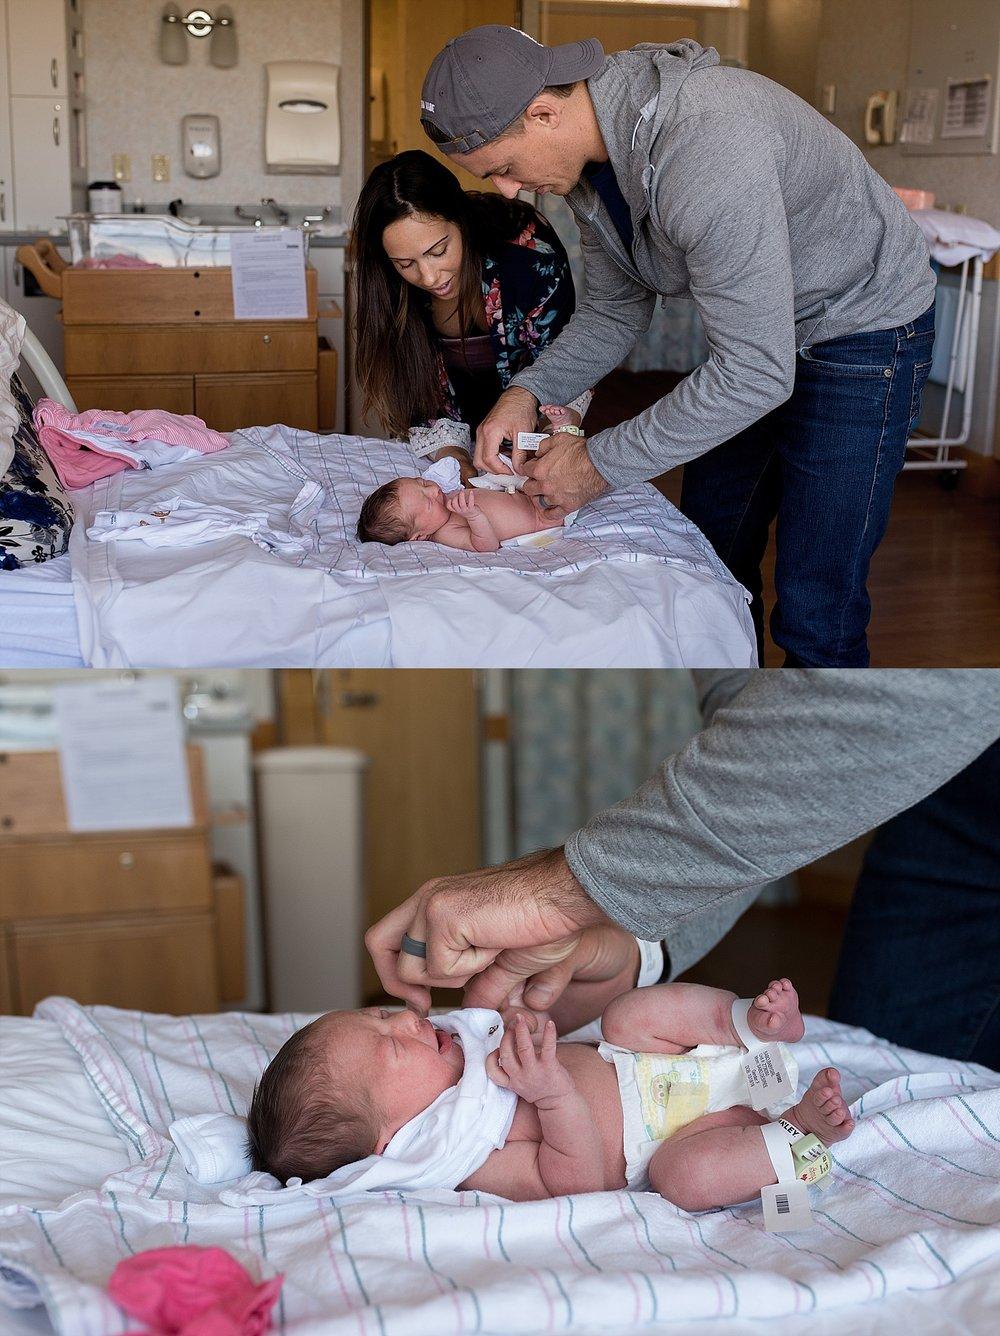 Newborn Hospital Photographer at Manchester Hospital.